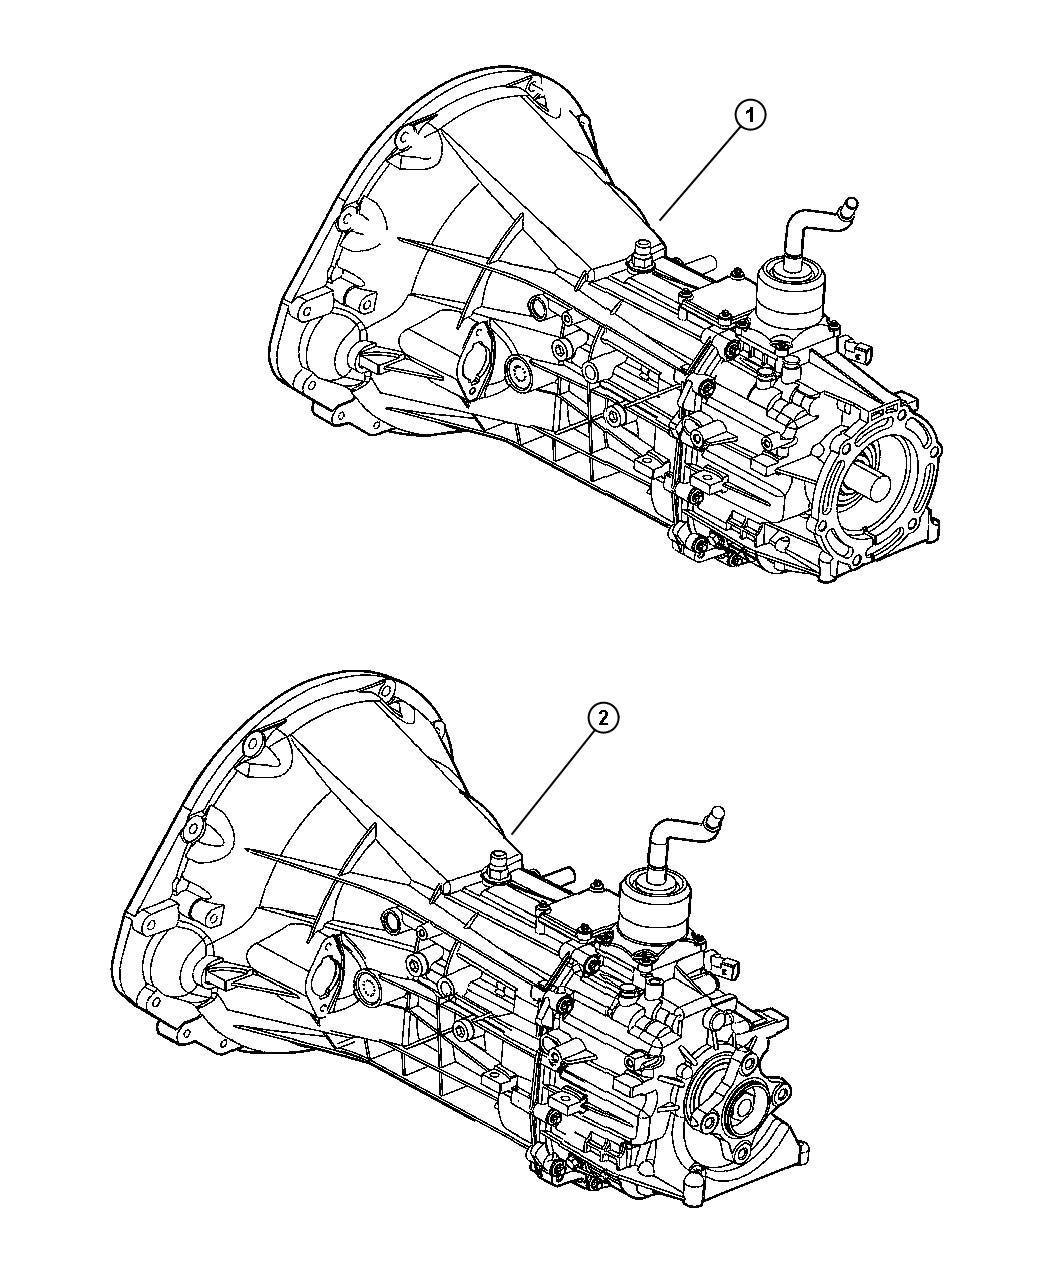 Dodge Dakota Trans 6 Speed 4wd Transmission